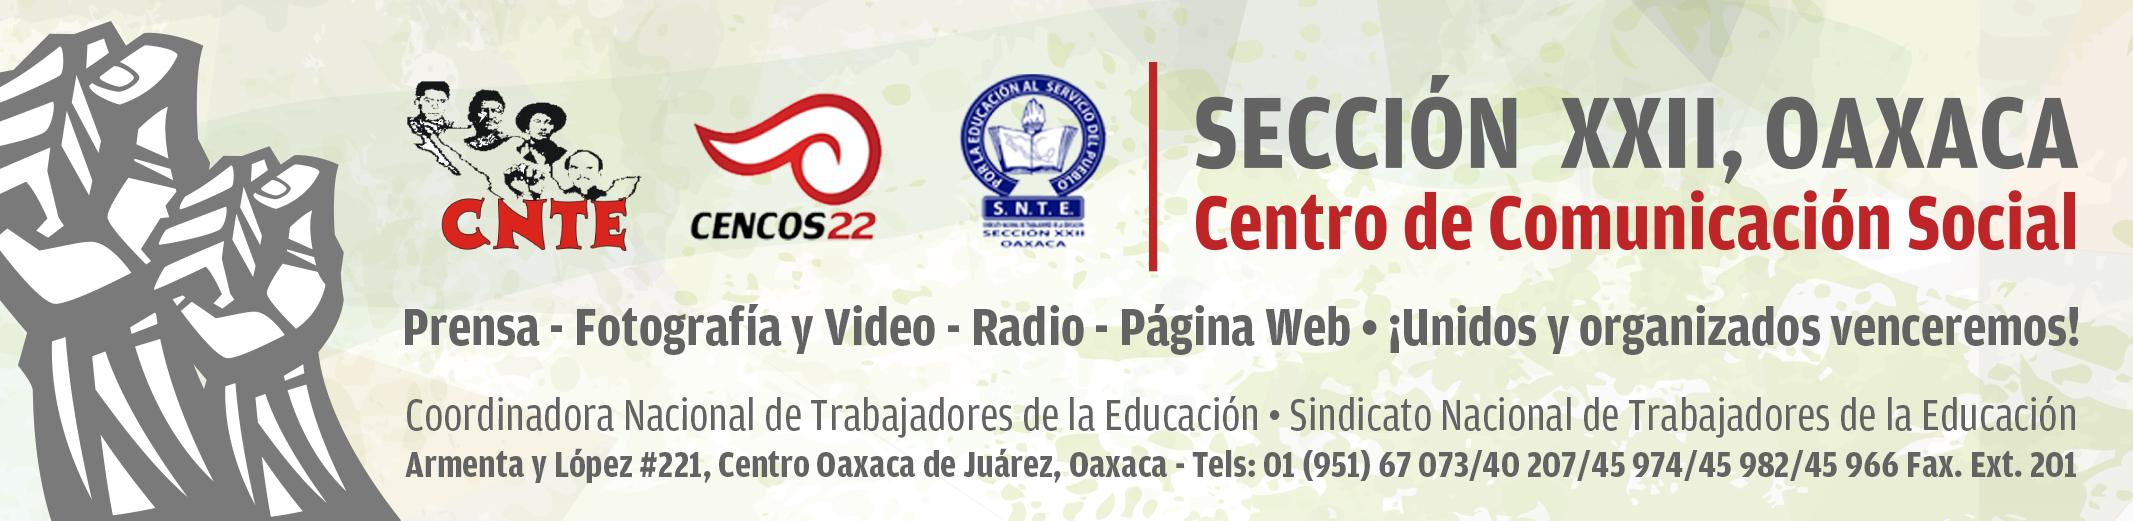 Centro de Comunicación Social de la Sección XXII